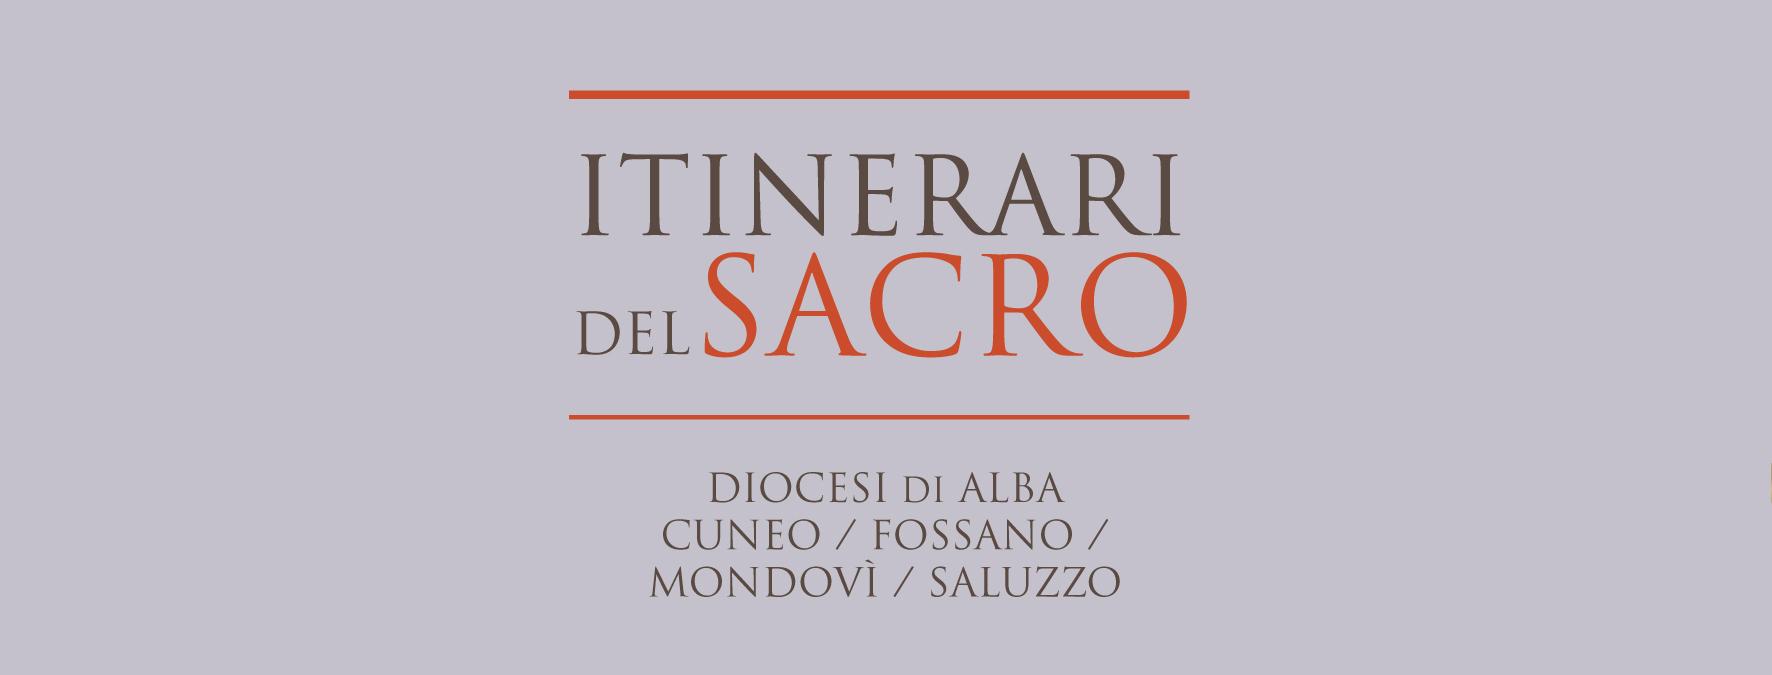 Itinerari del Sacro